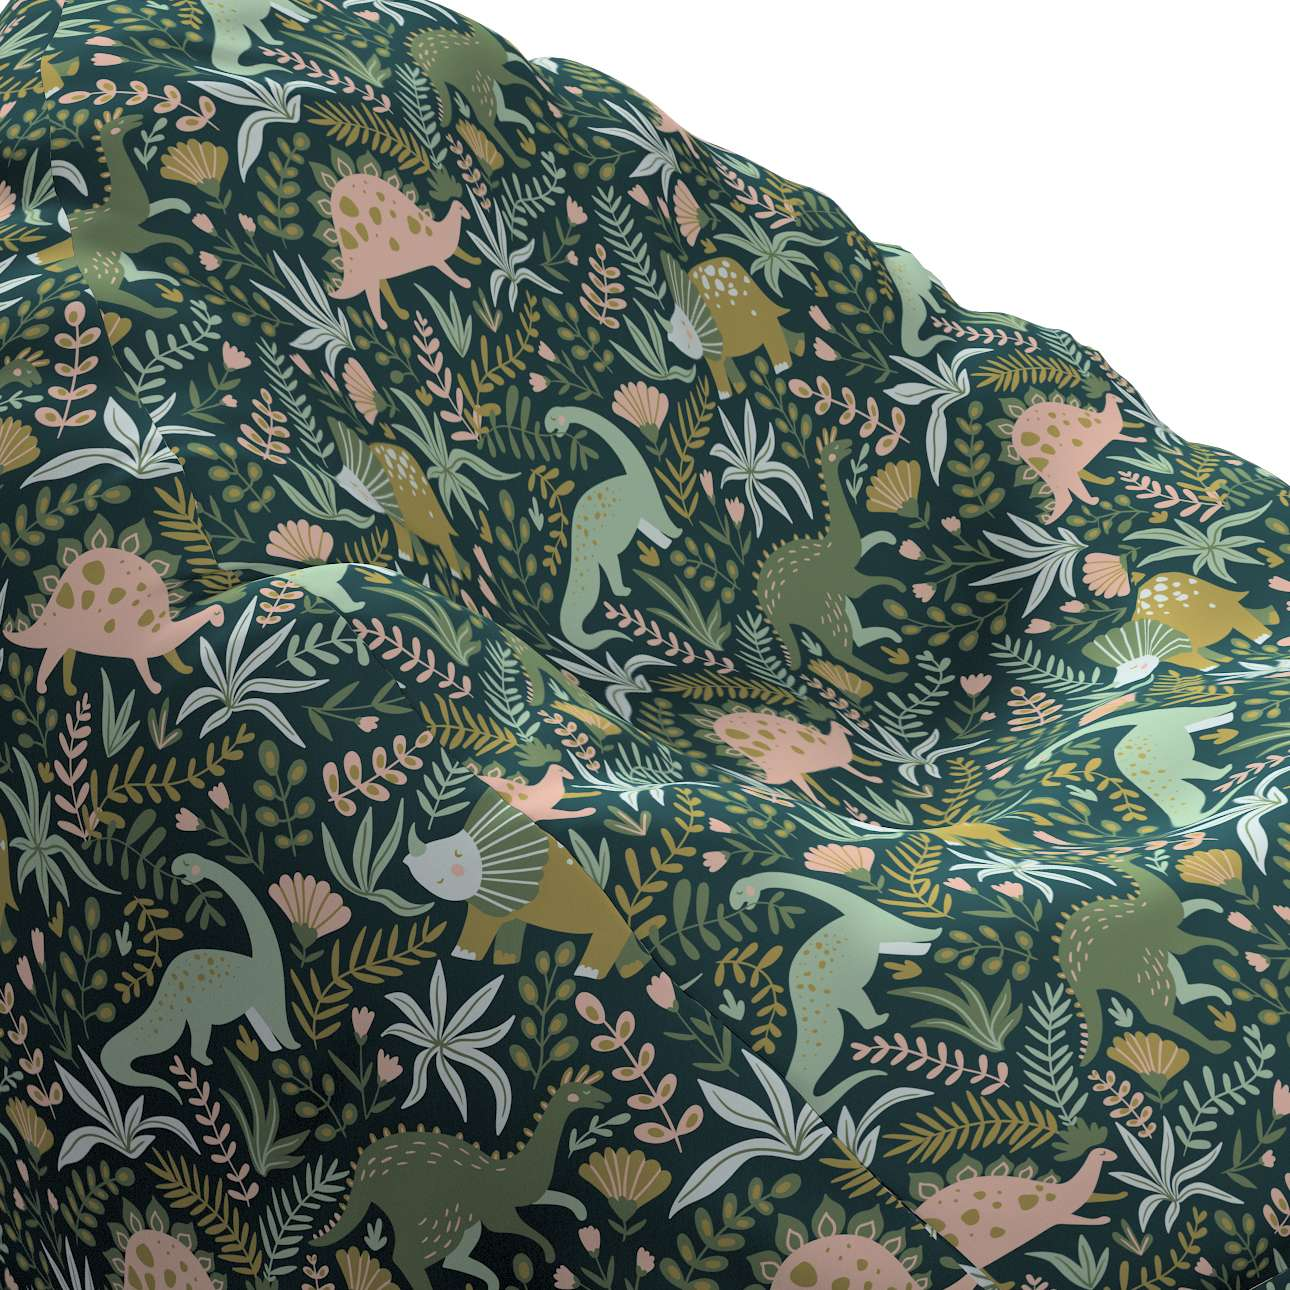 Sedací vak Bowli v kolekci Magic Collection, látka: 500-20